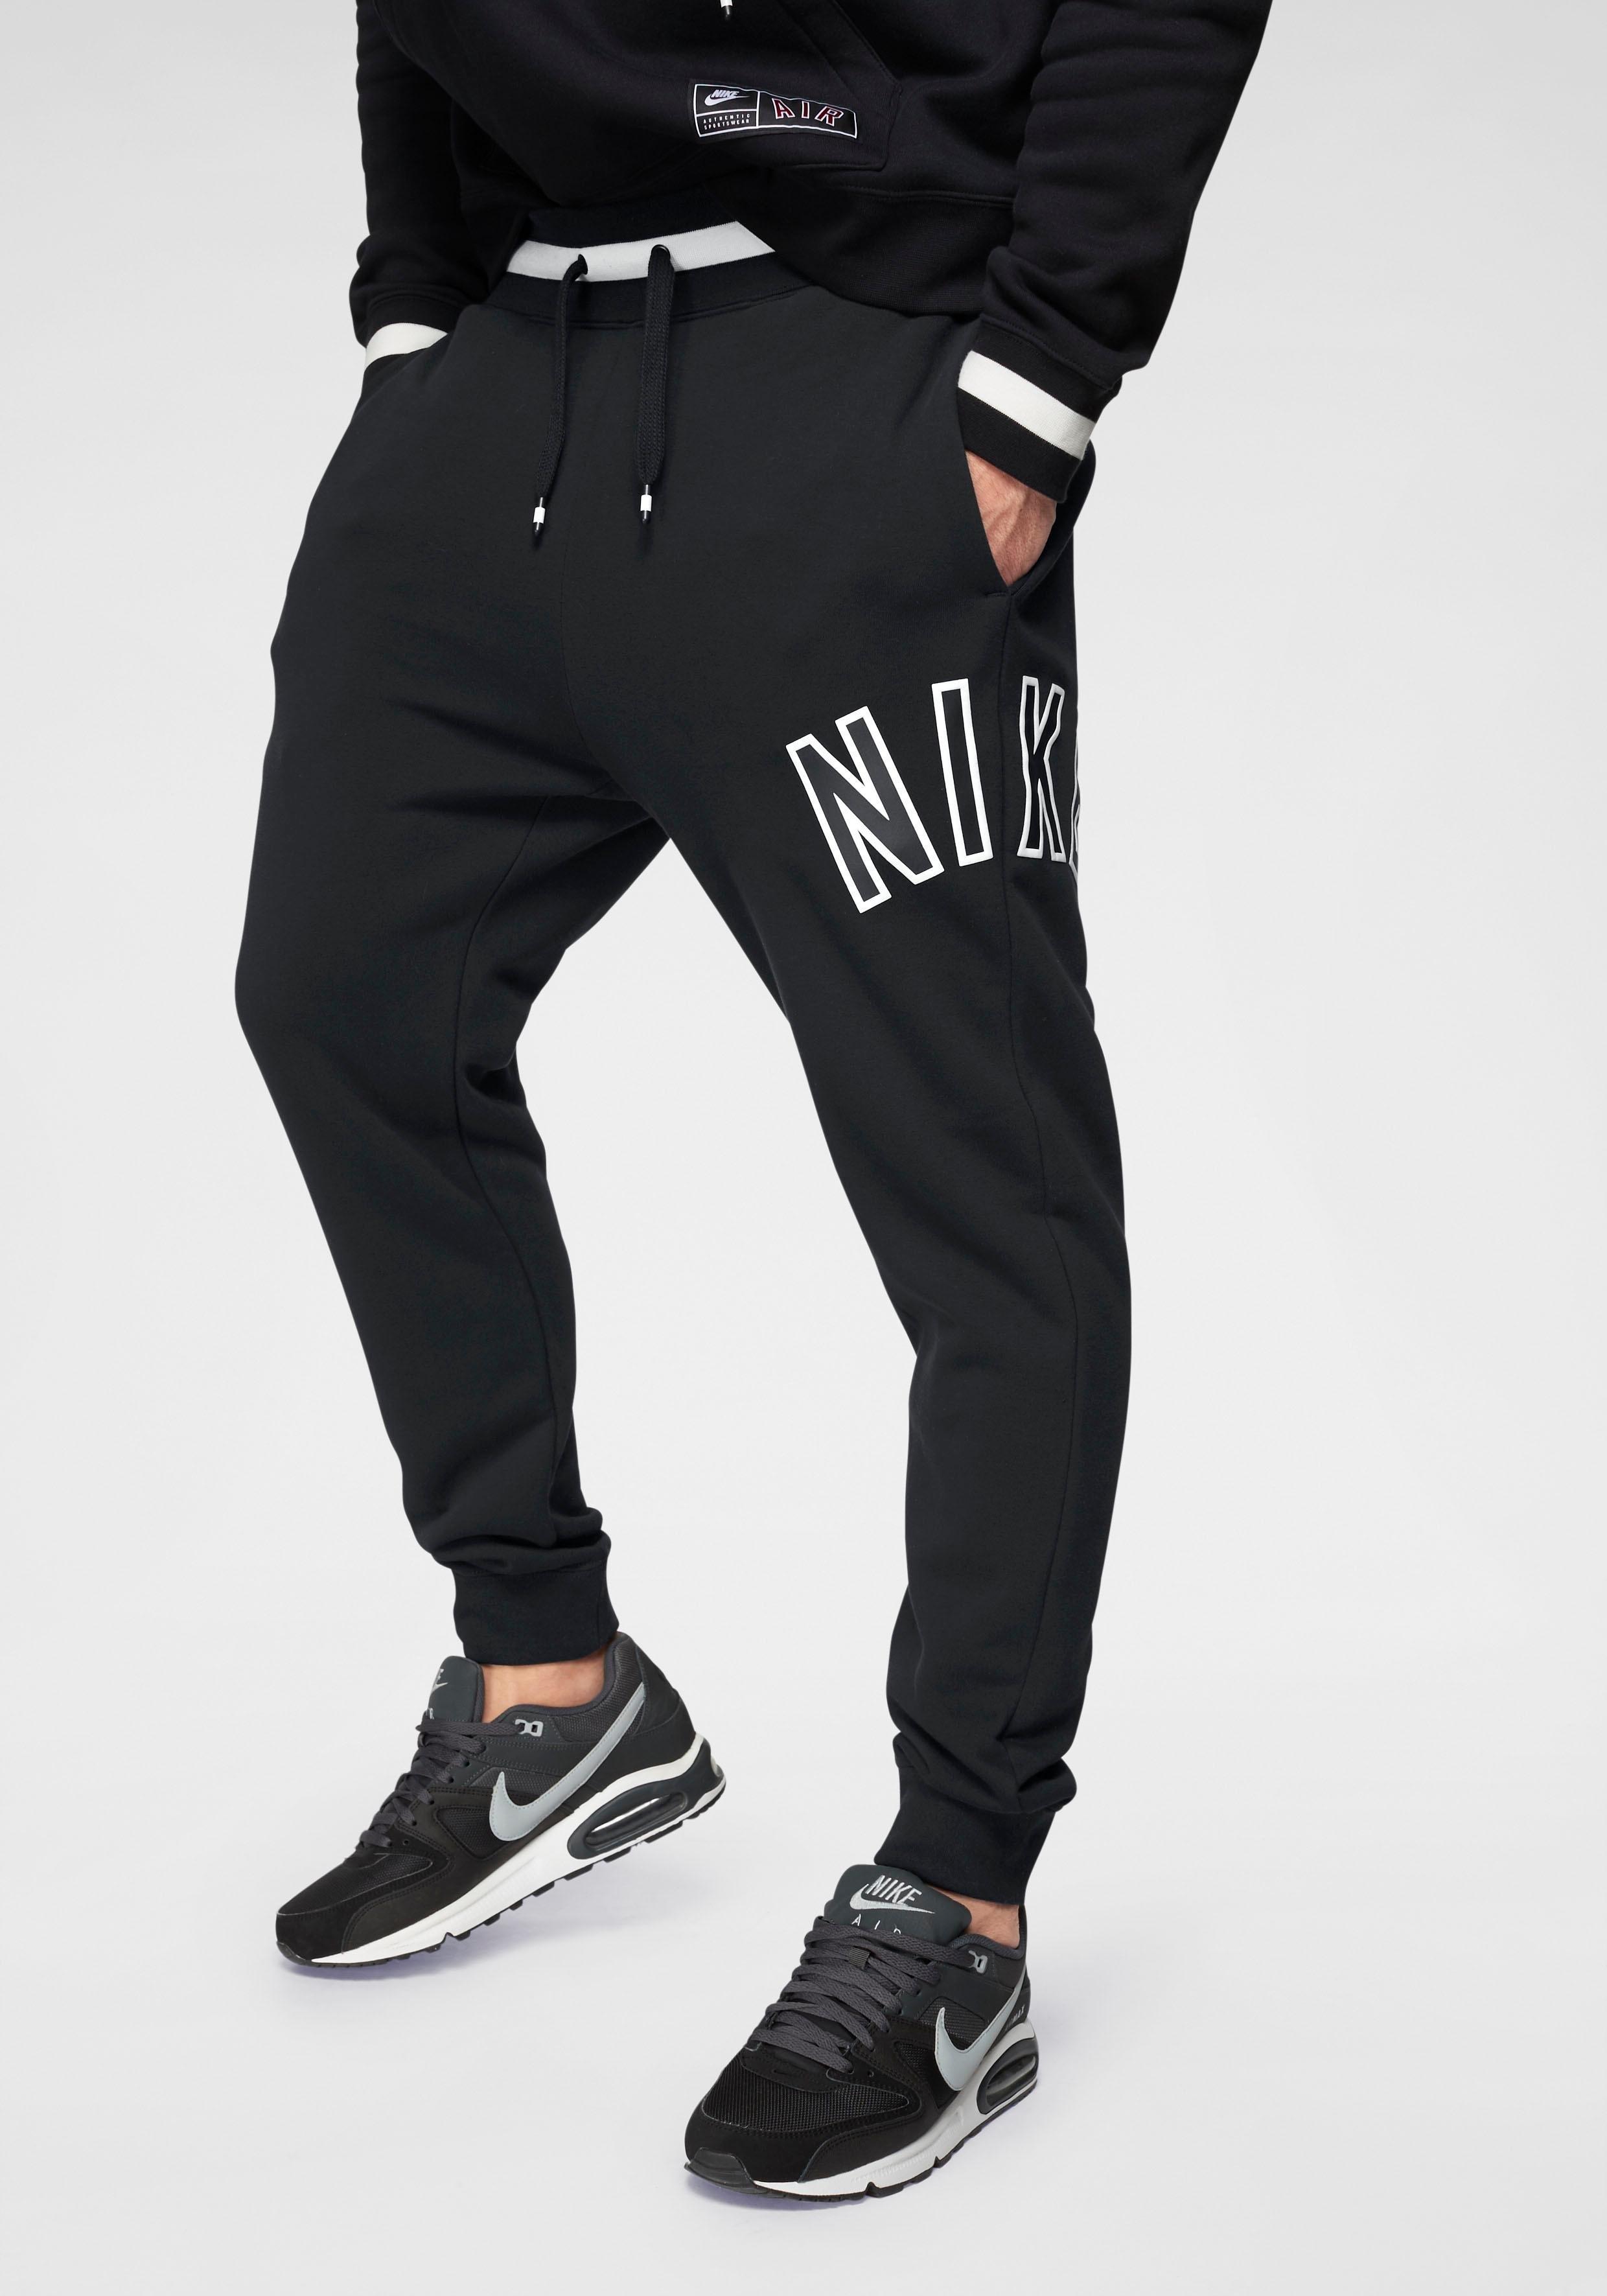 19c33491e0e0 Afbeeldingsbron  Nike Sportswear joggingbroek »M NSW NIKE AIR PANT FLC«